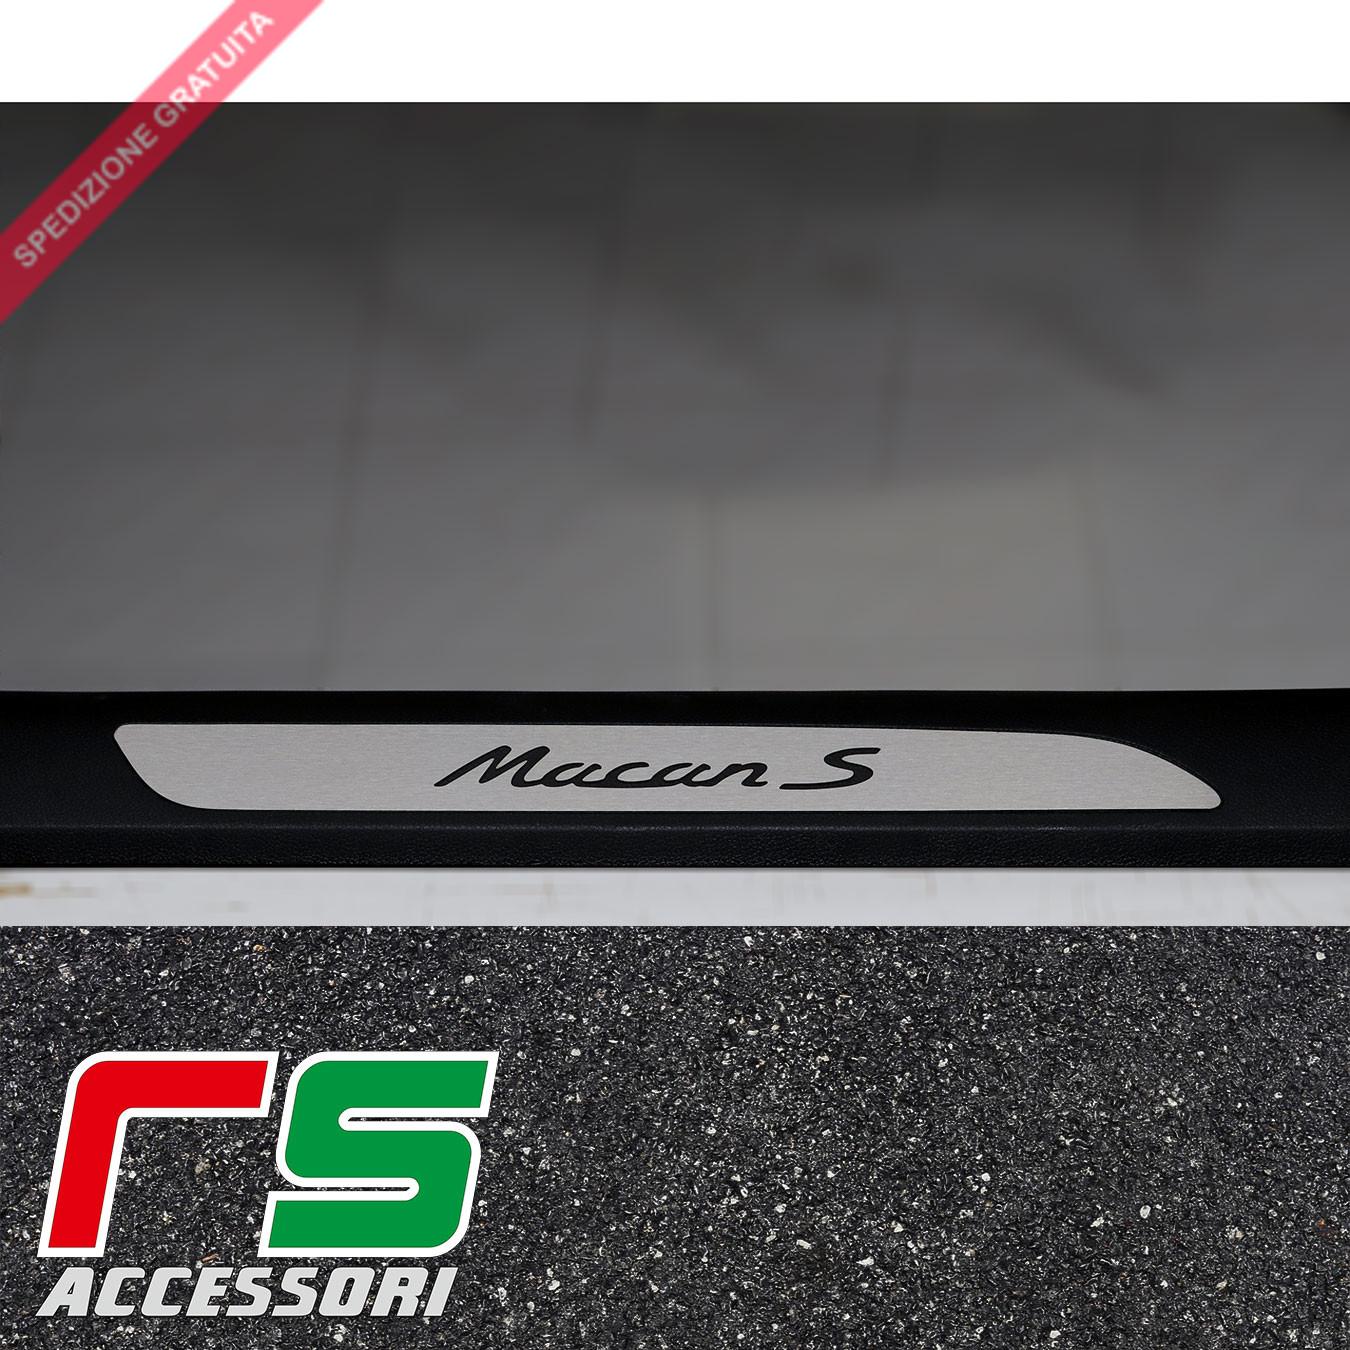 Porsche Macan S battitacco sottoporta in acciaio inox